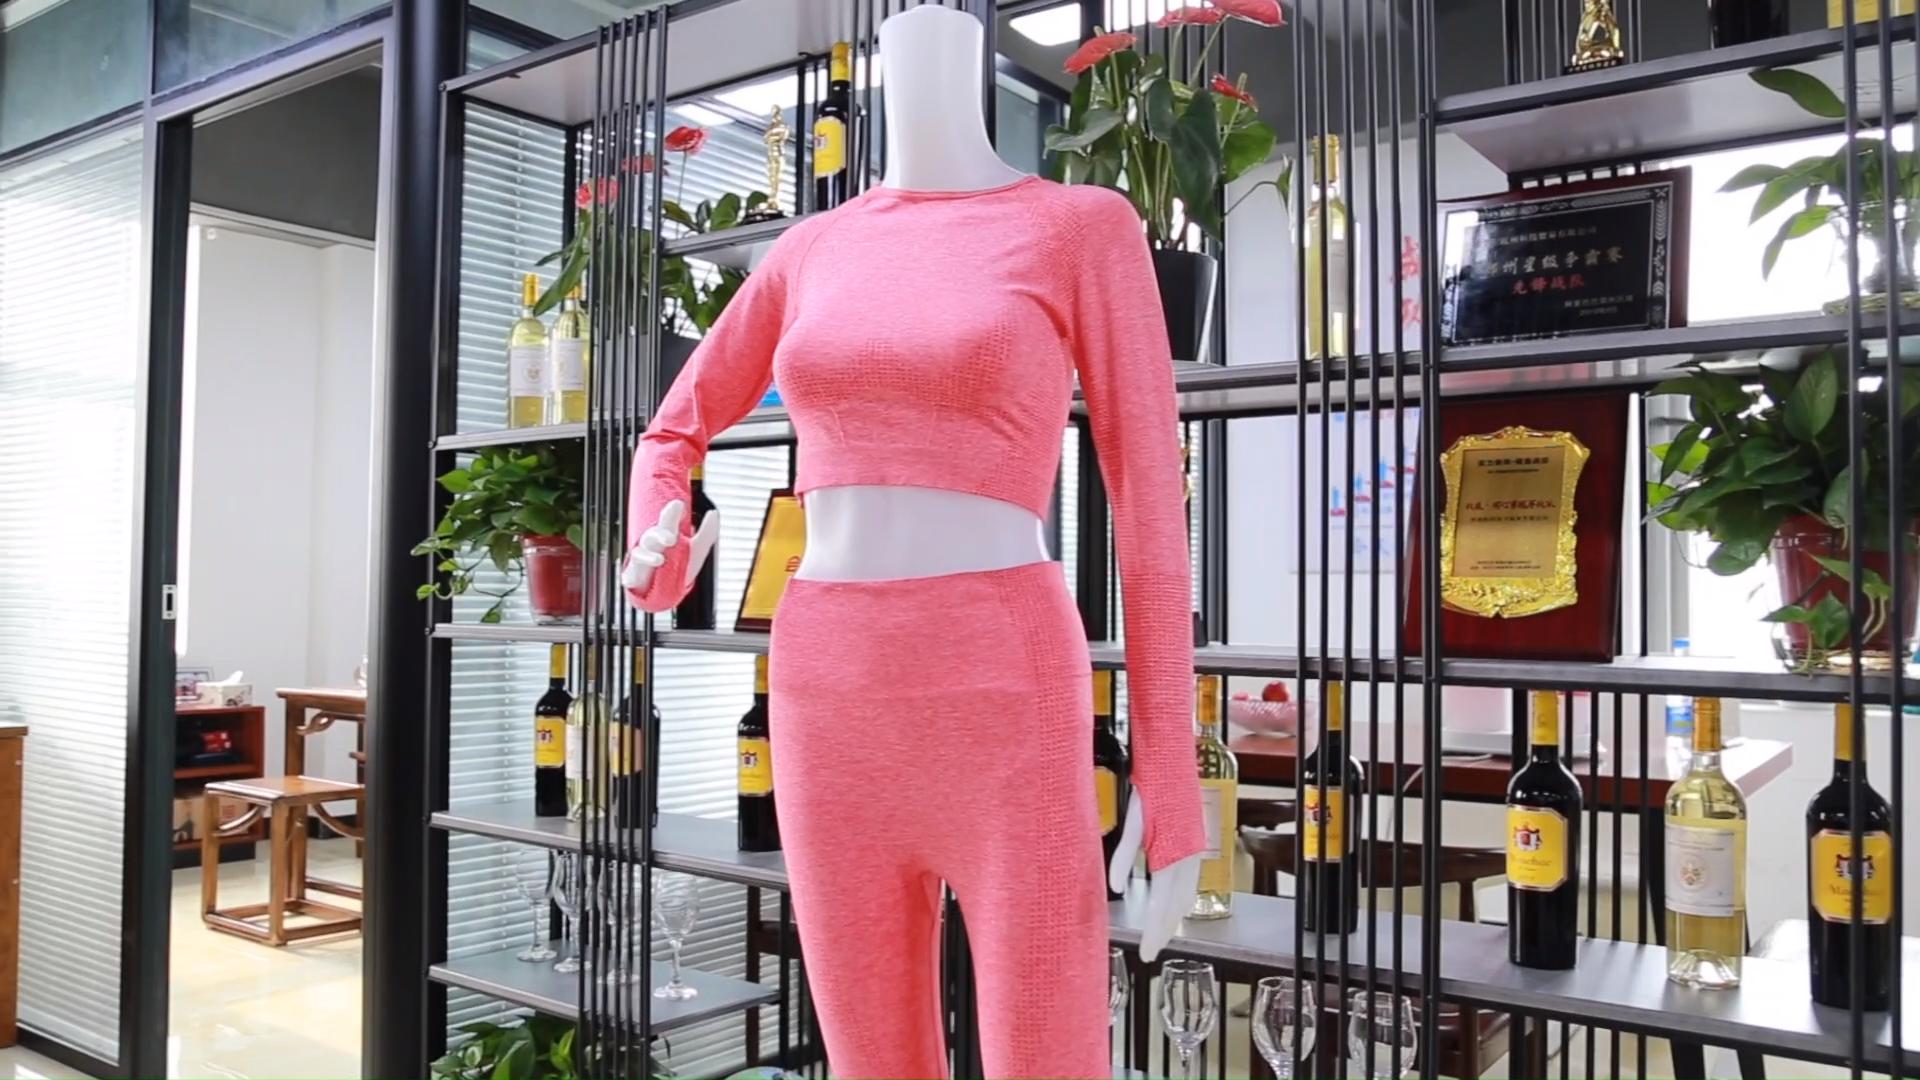 Groothandel Fitness Yoga Wear 5Pcs Naadloze Workout Vrouwen Gym Sets